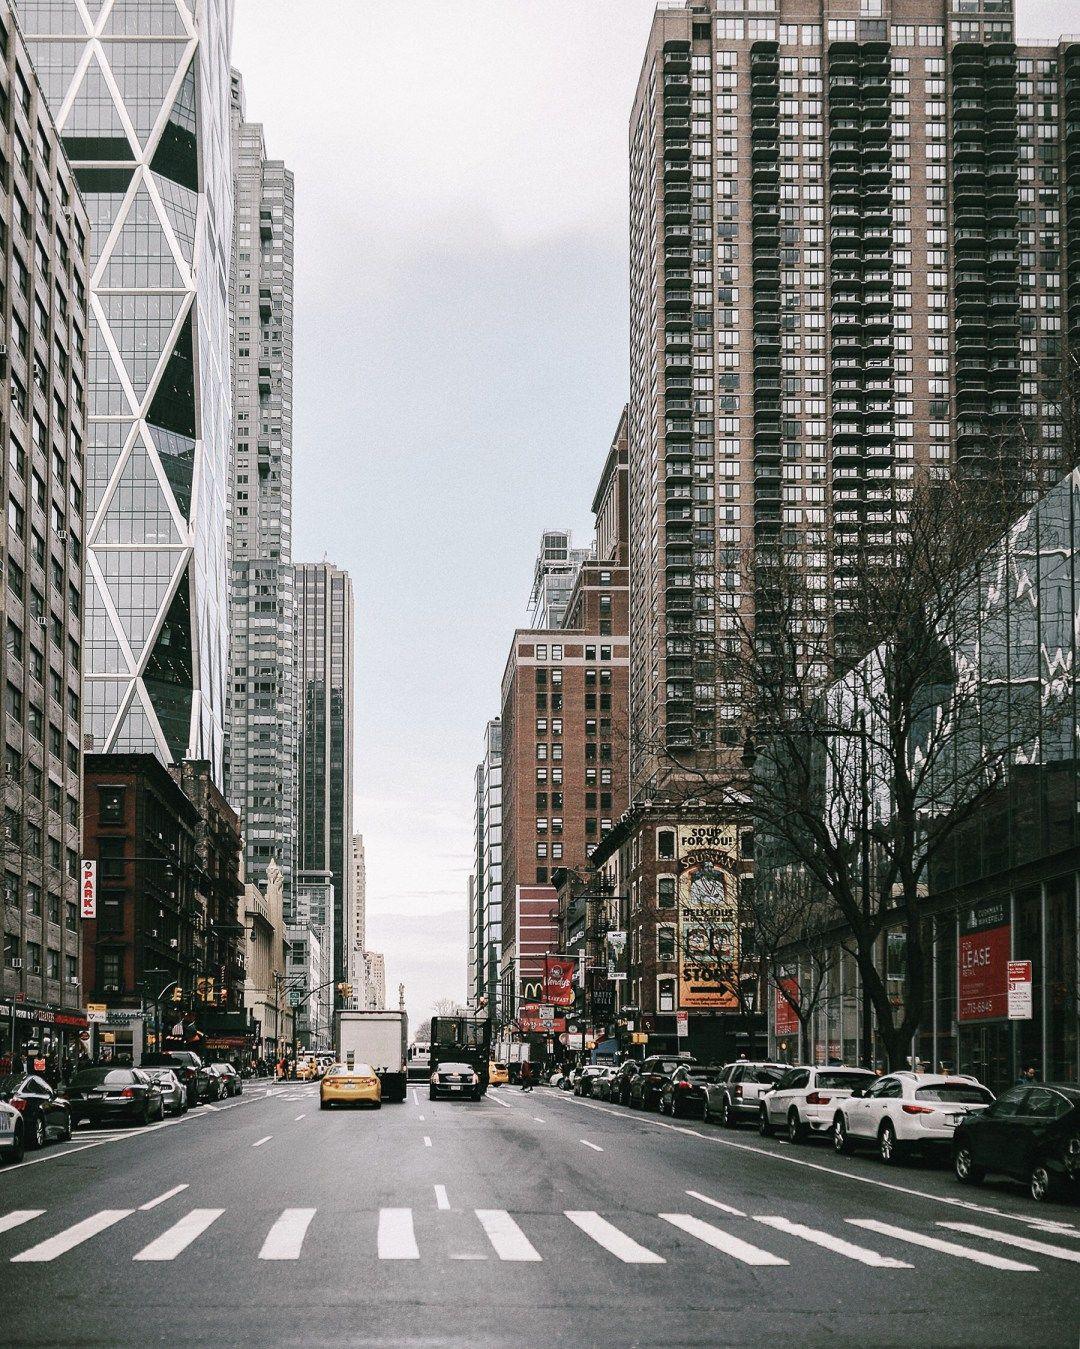 Hustle bustle   #photooftheday #fashionblog #style #nycblogger #nyc #citylife #midtown #concretejungle #skyscrapers #styleblog #aesthetic